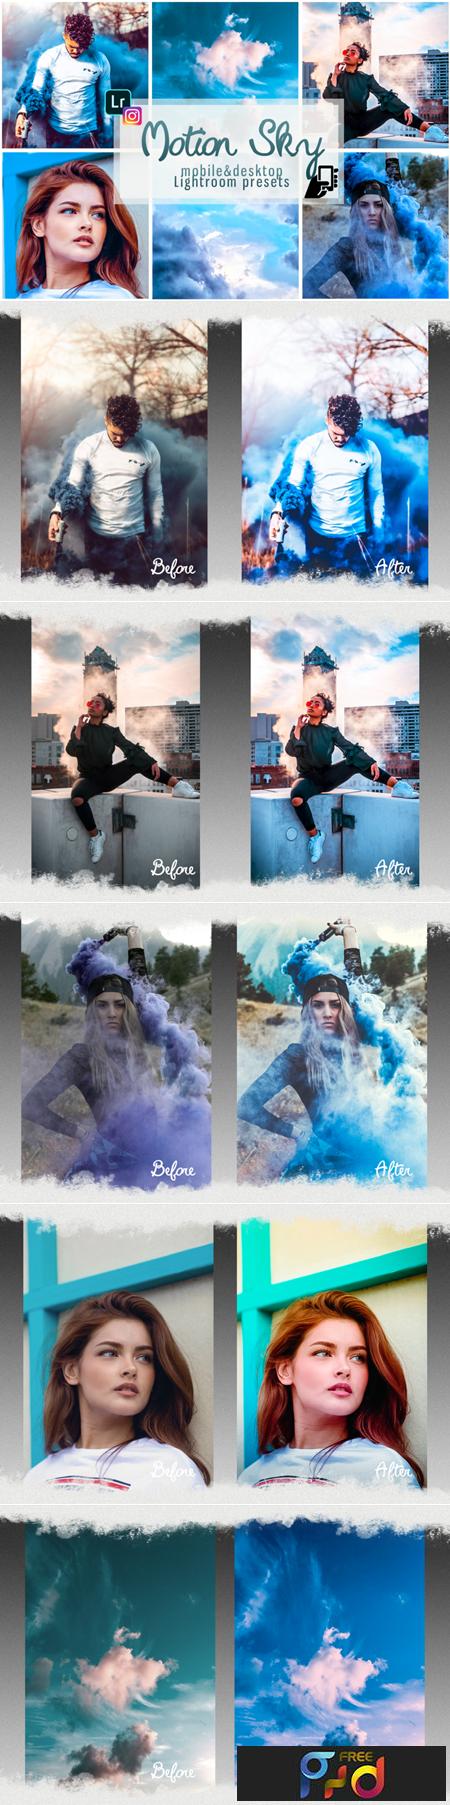 Motion sky presets mobile pc instagram 1